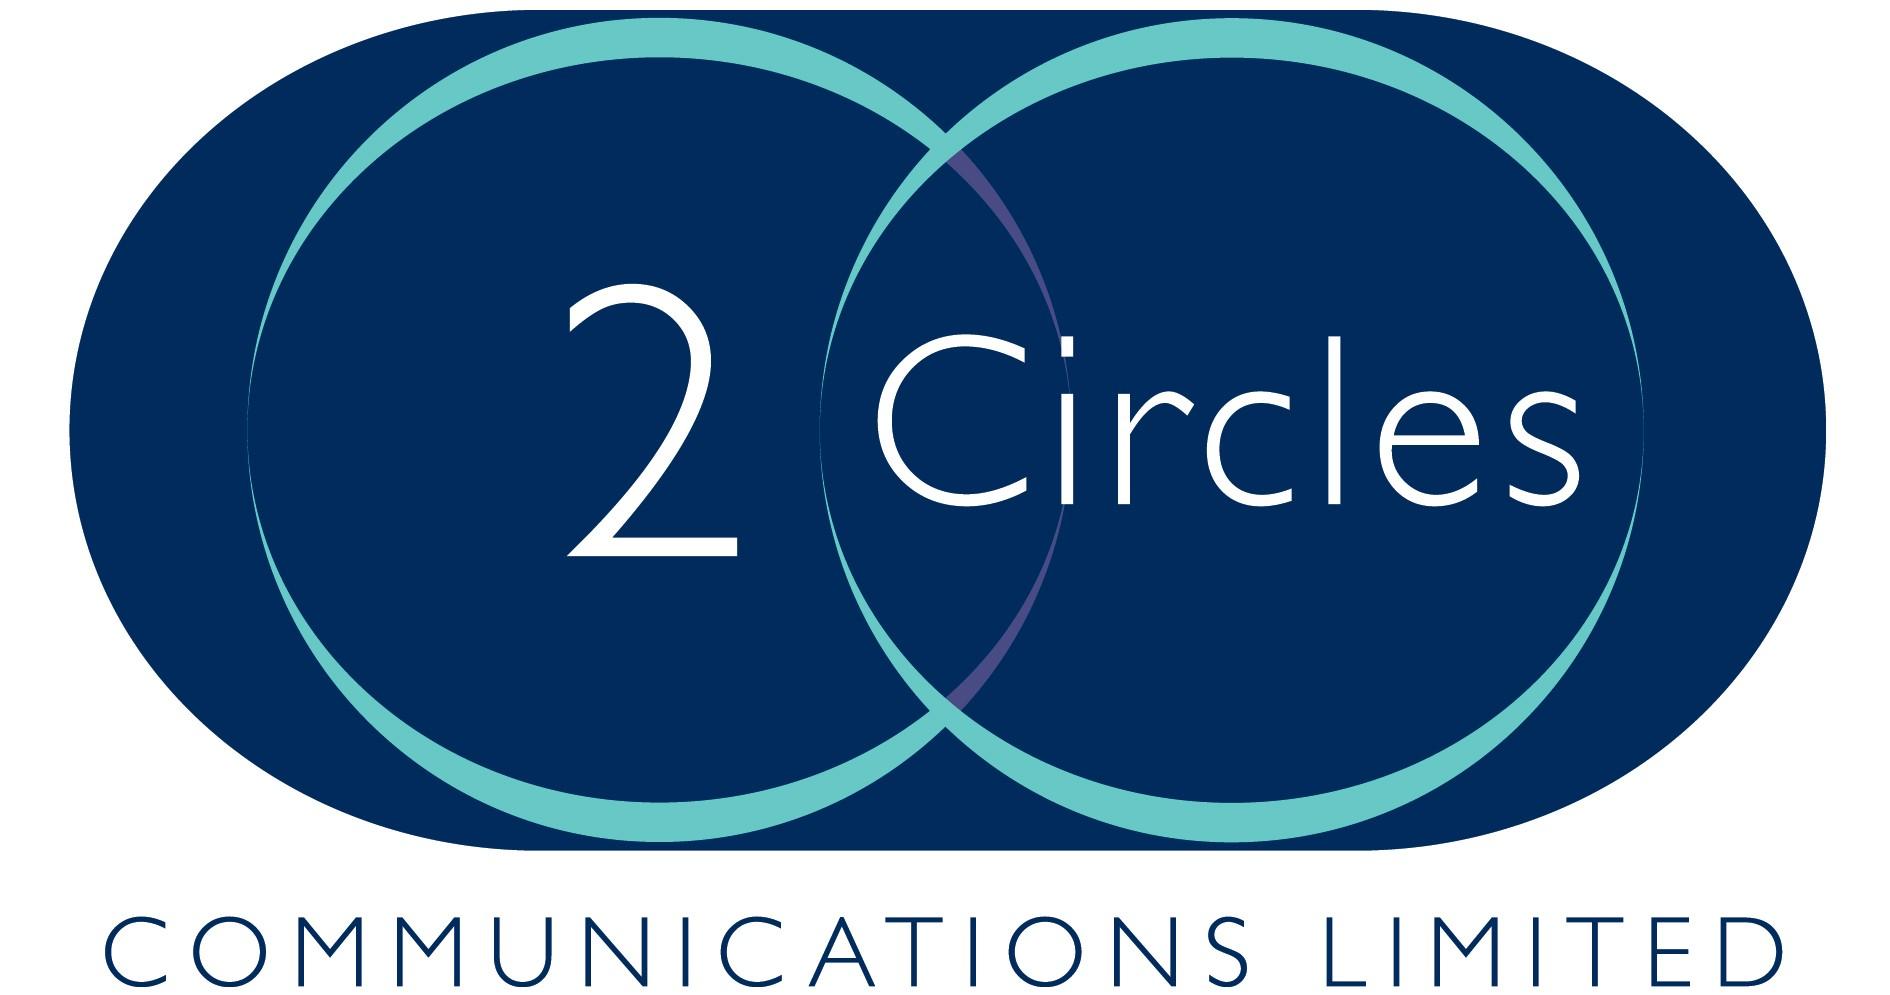 2 Circles Comms Ltd logo - March 2011